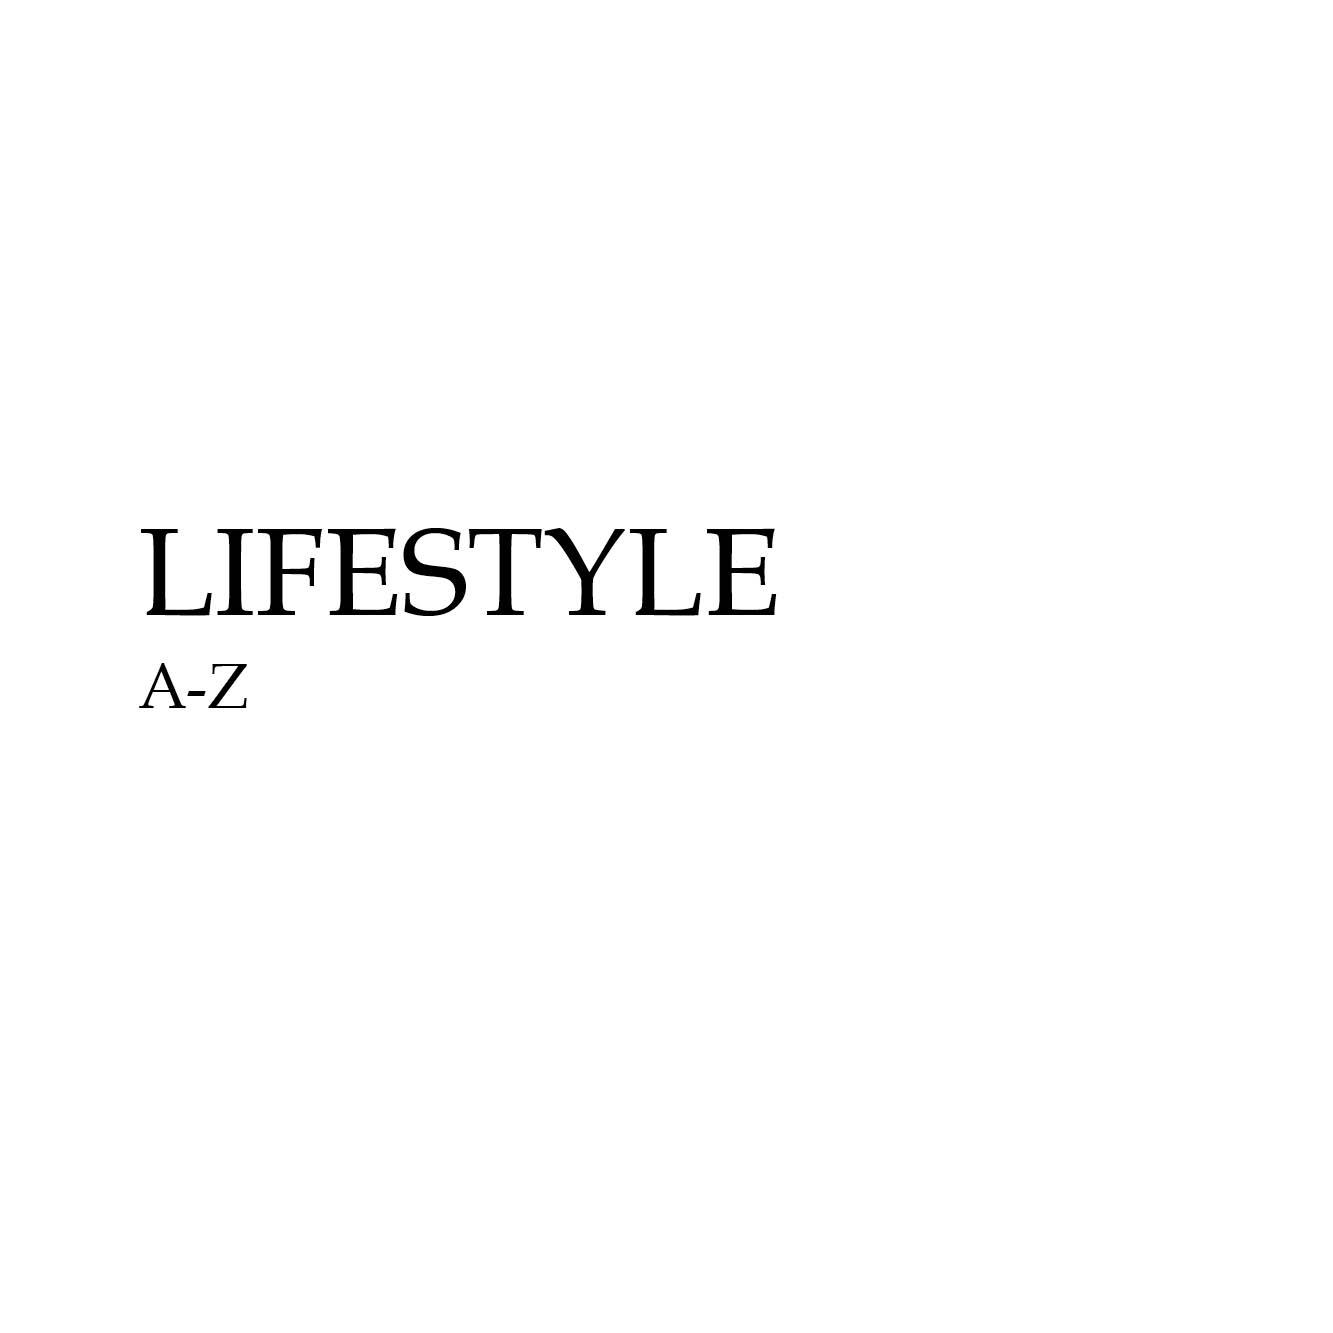 WTL_Watch_That_Label_Lifestyle_A-Z